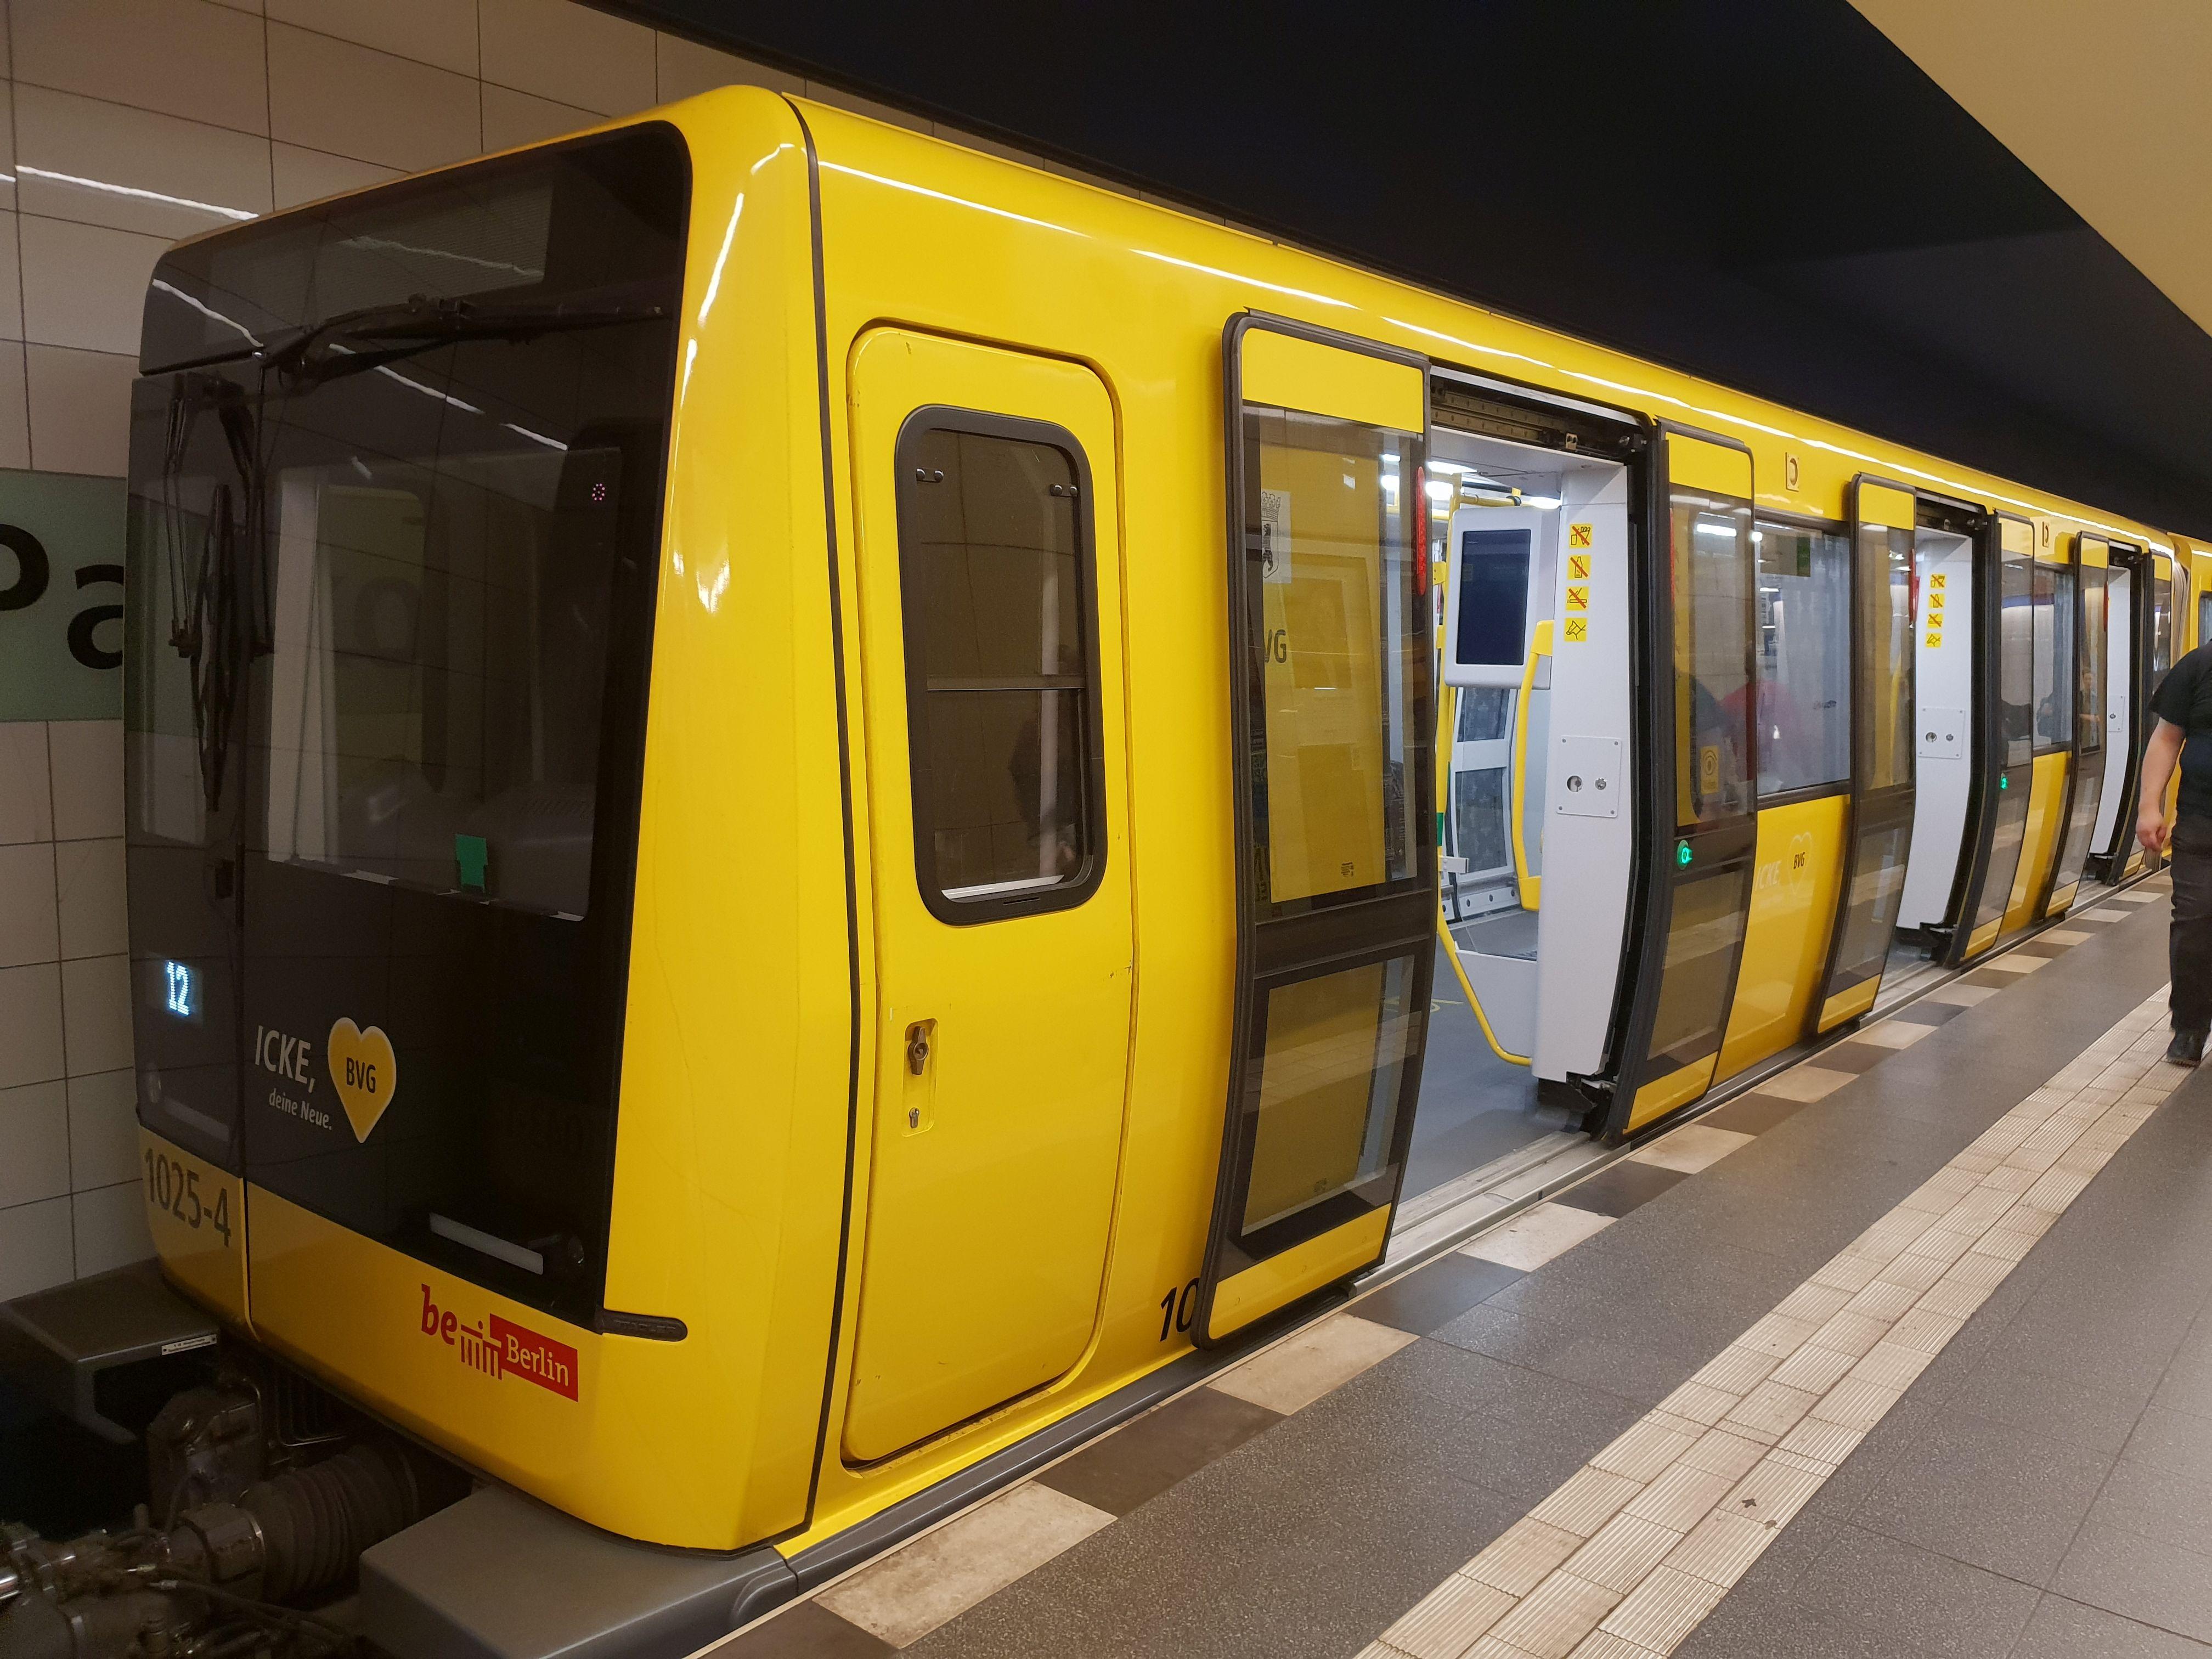 U-Bahn 1025-4, Baureihe IK, Prototyp IK, Berlin-Pankow, September 2018